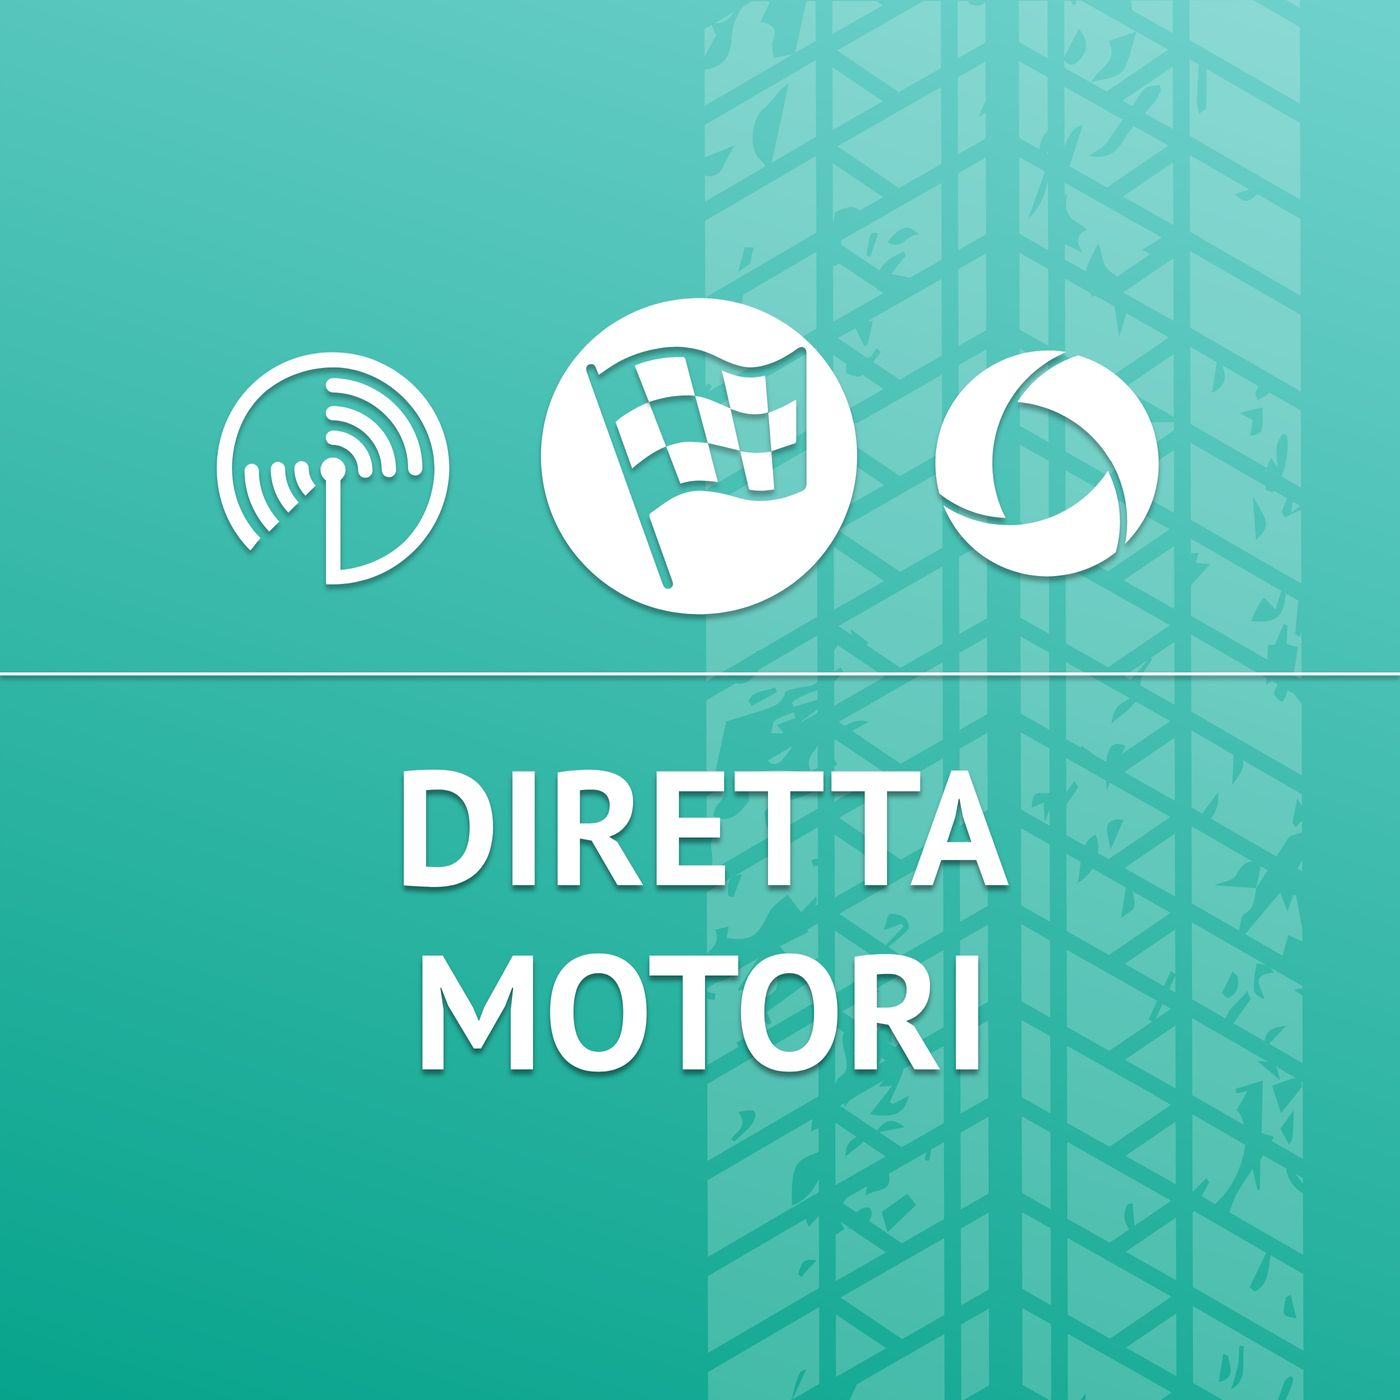 Diretta Motori